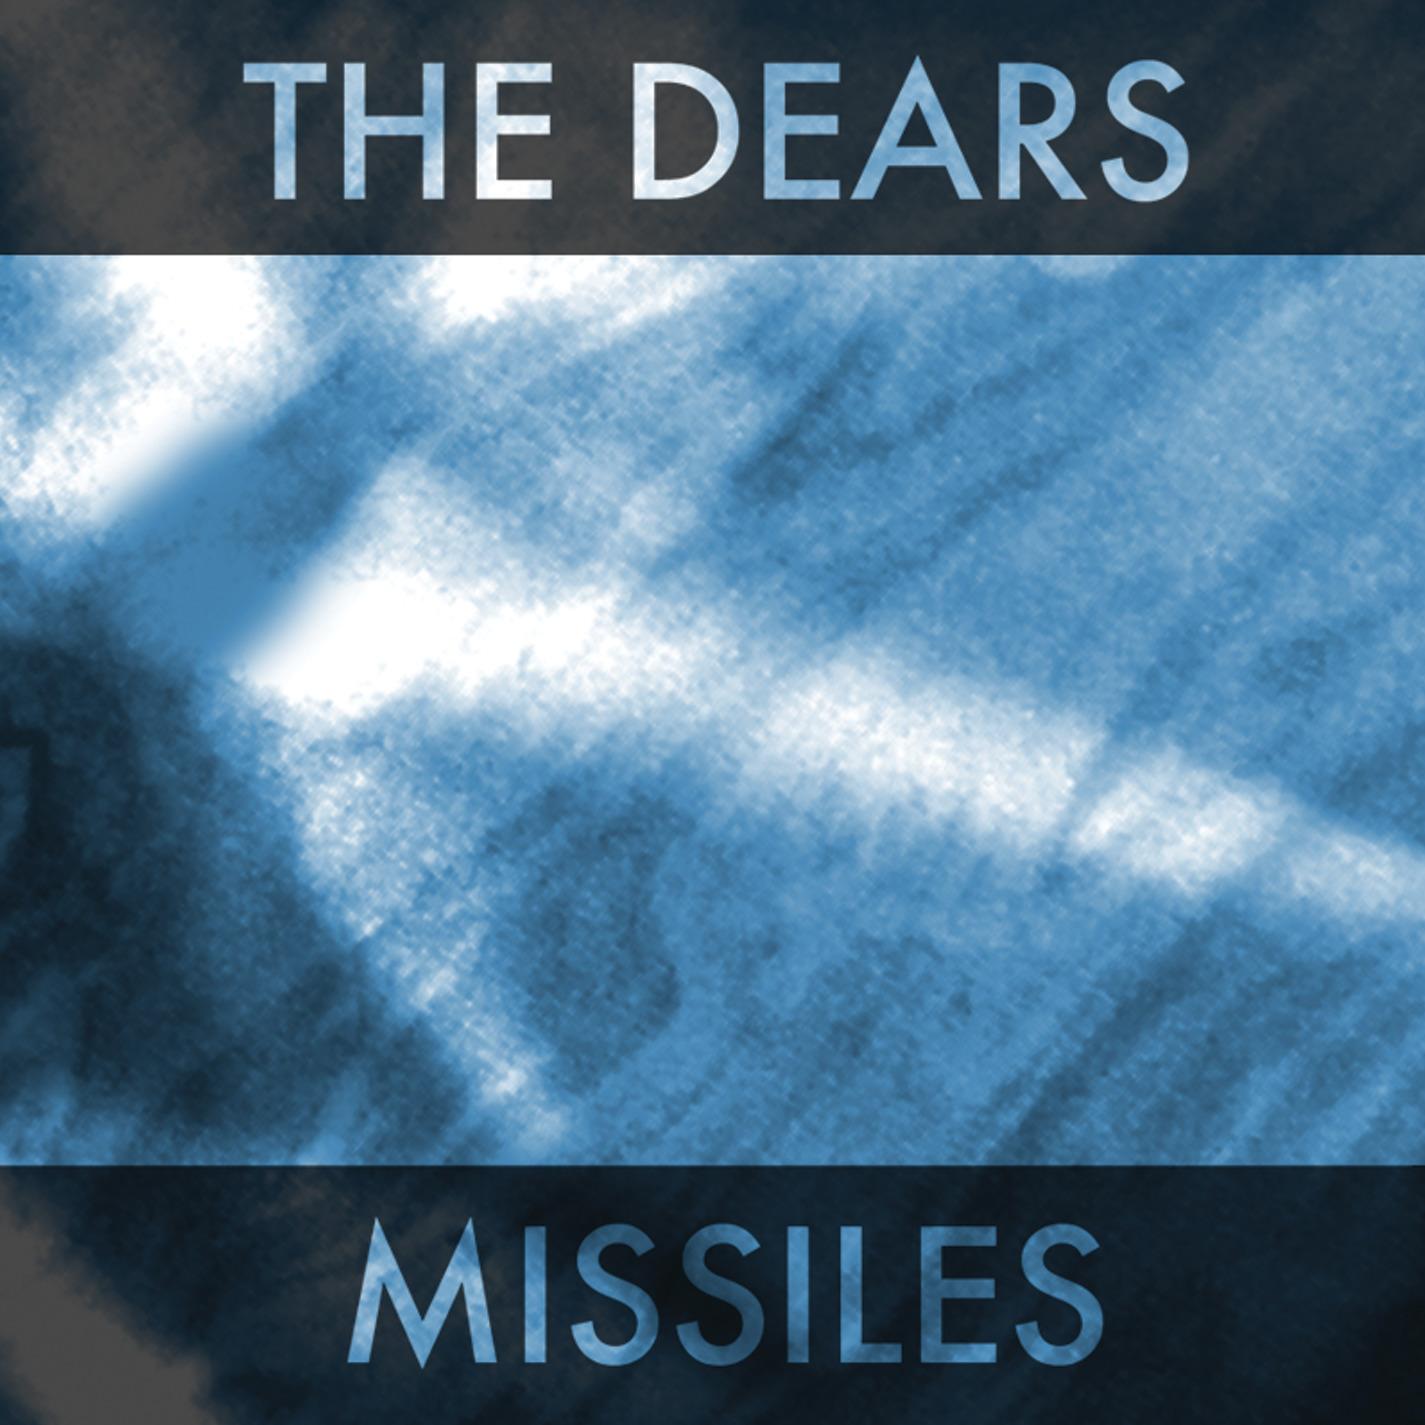 The Dears - Missiles - Digital